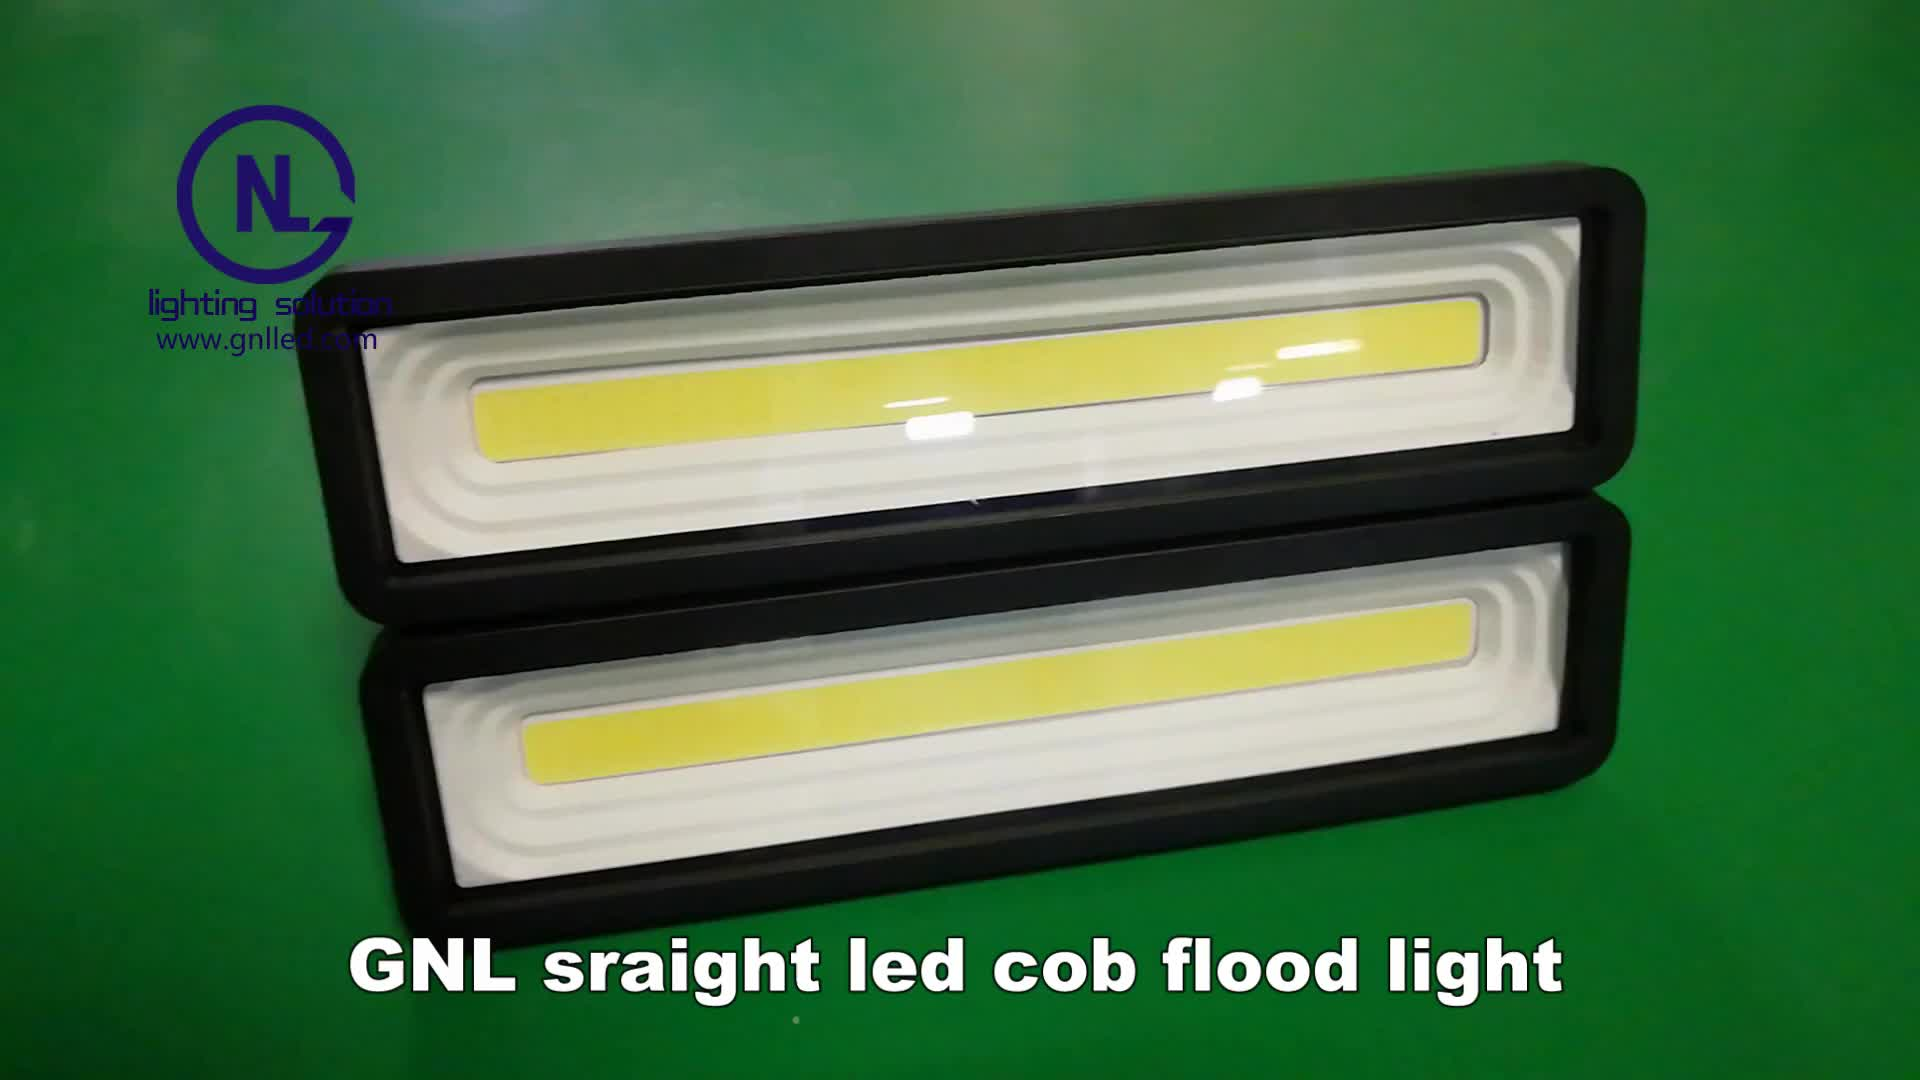 GNL aluminum alloy bright led cob flood light outdoor bulb replacement 50w